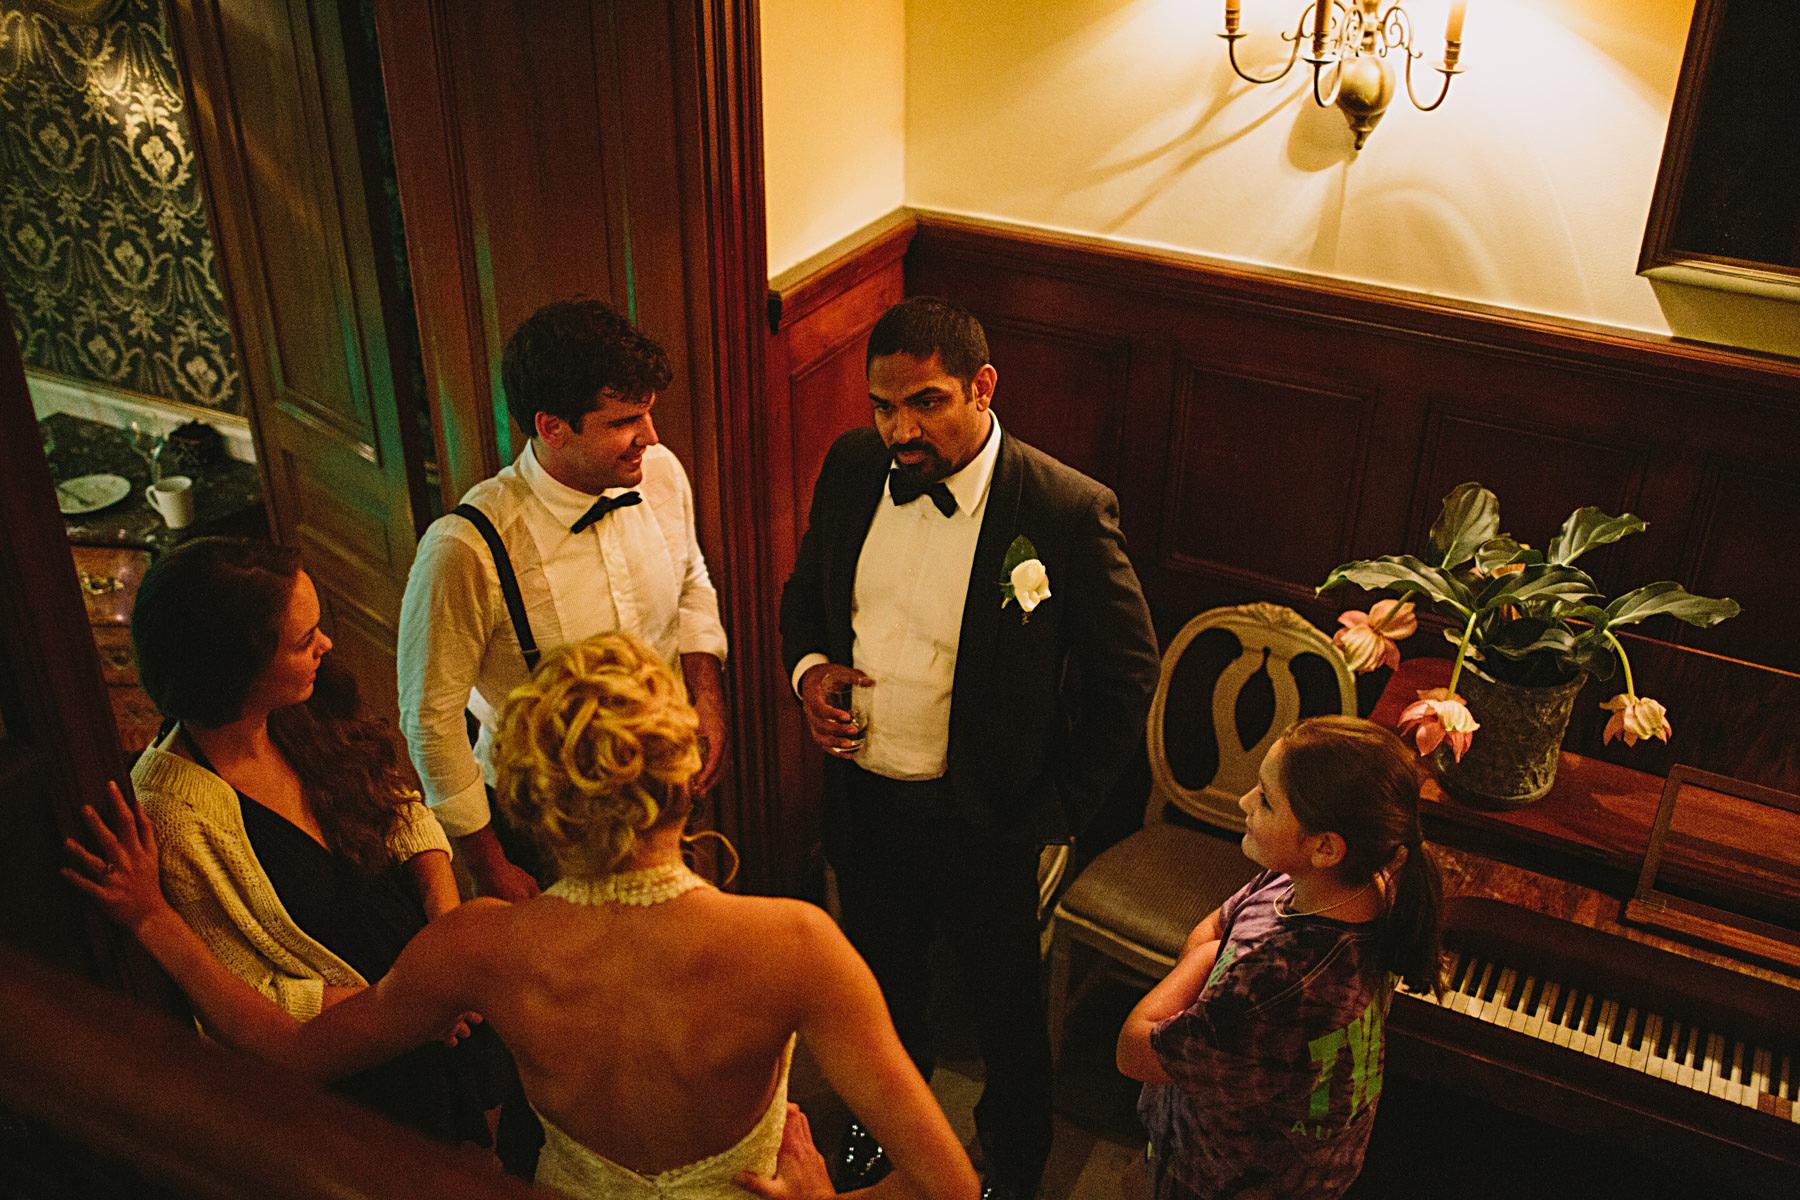 mingel pa broellopsfest i korridoren